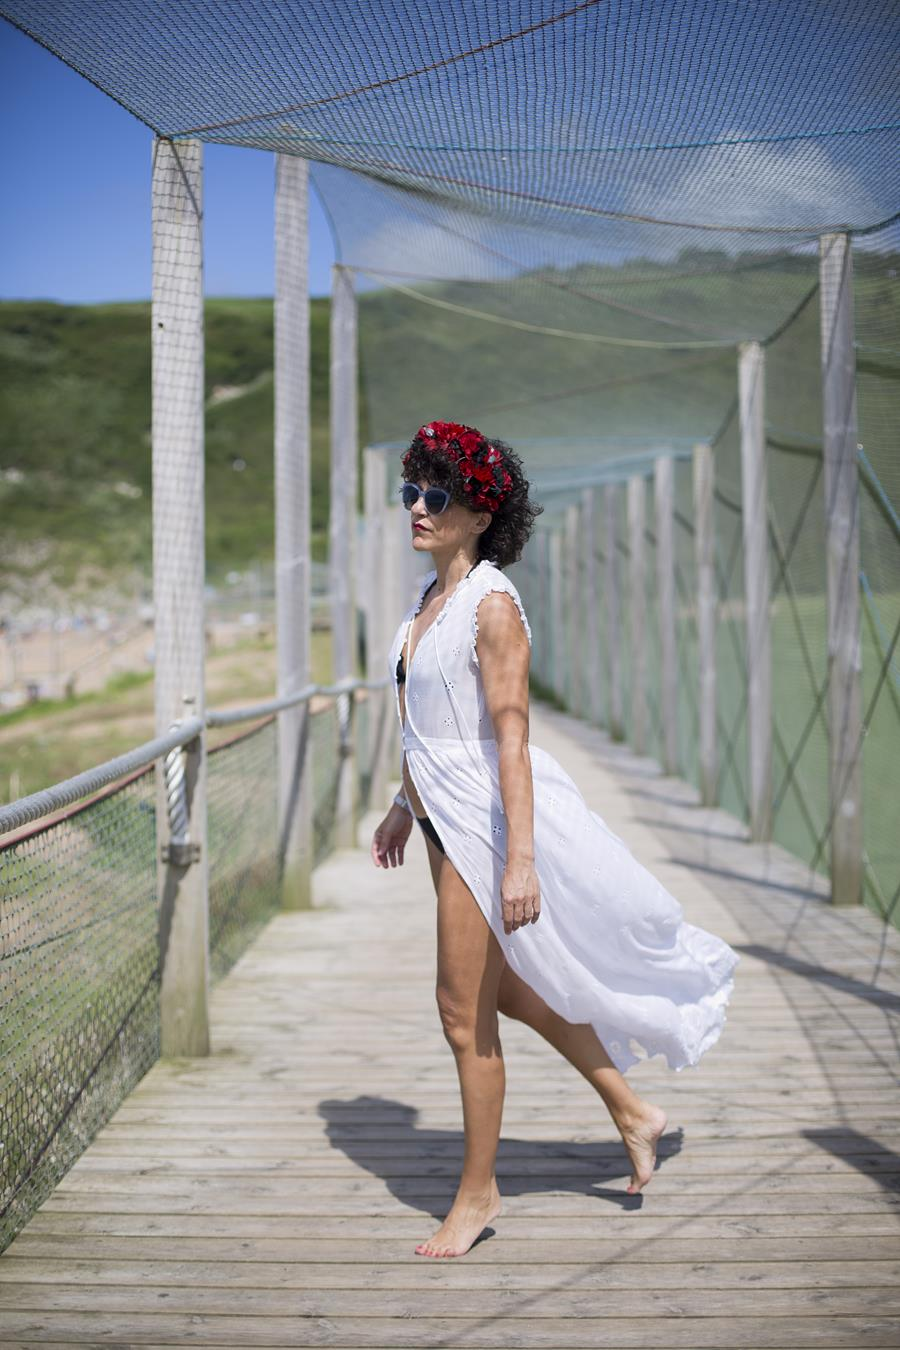 Rebeca Valdivia, asesora de imagen, personal shopper, estilista, stilist, Donostia, San Sebastián, Miss Clov, bikini negro, beach ware, tiara, diadema de flores preservadas, la tiara de maría, artesano, handmade, bolso guipur, vestido blanco, boho, white dress, Zarautz